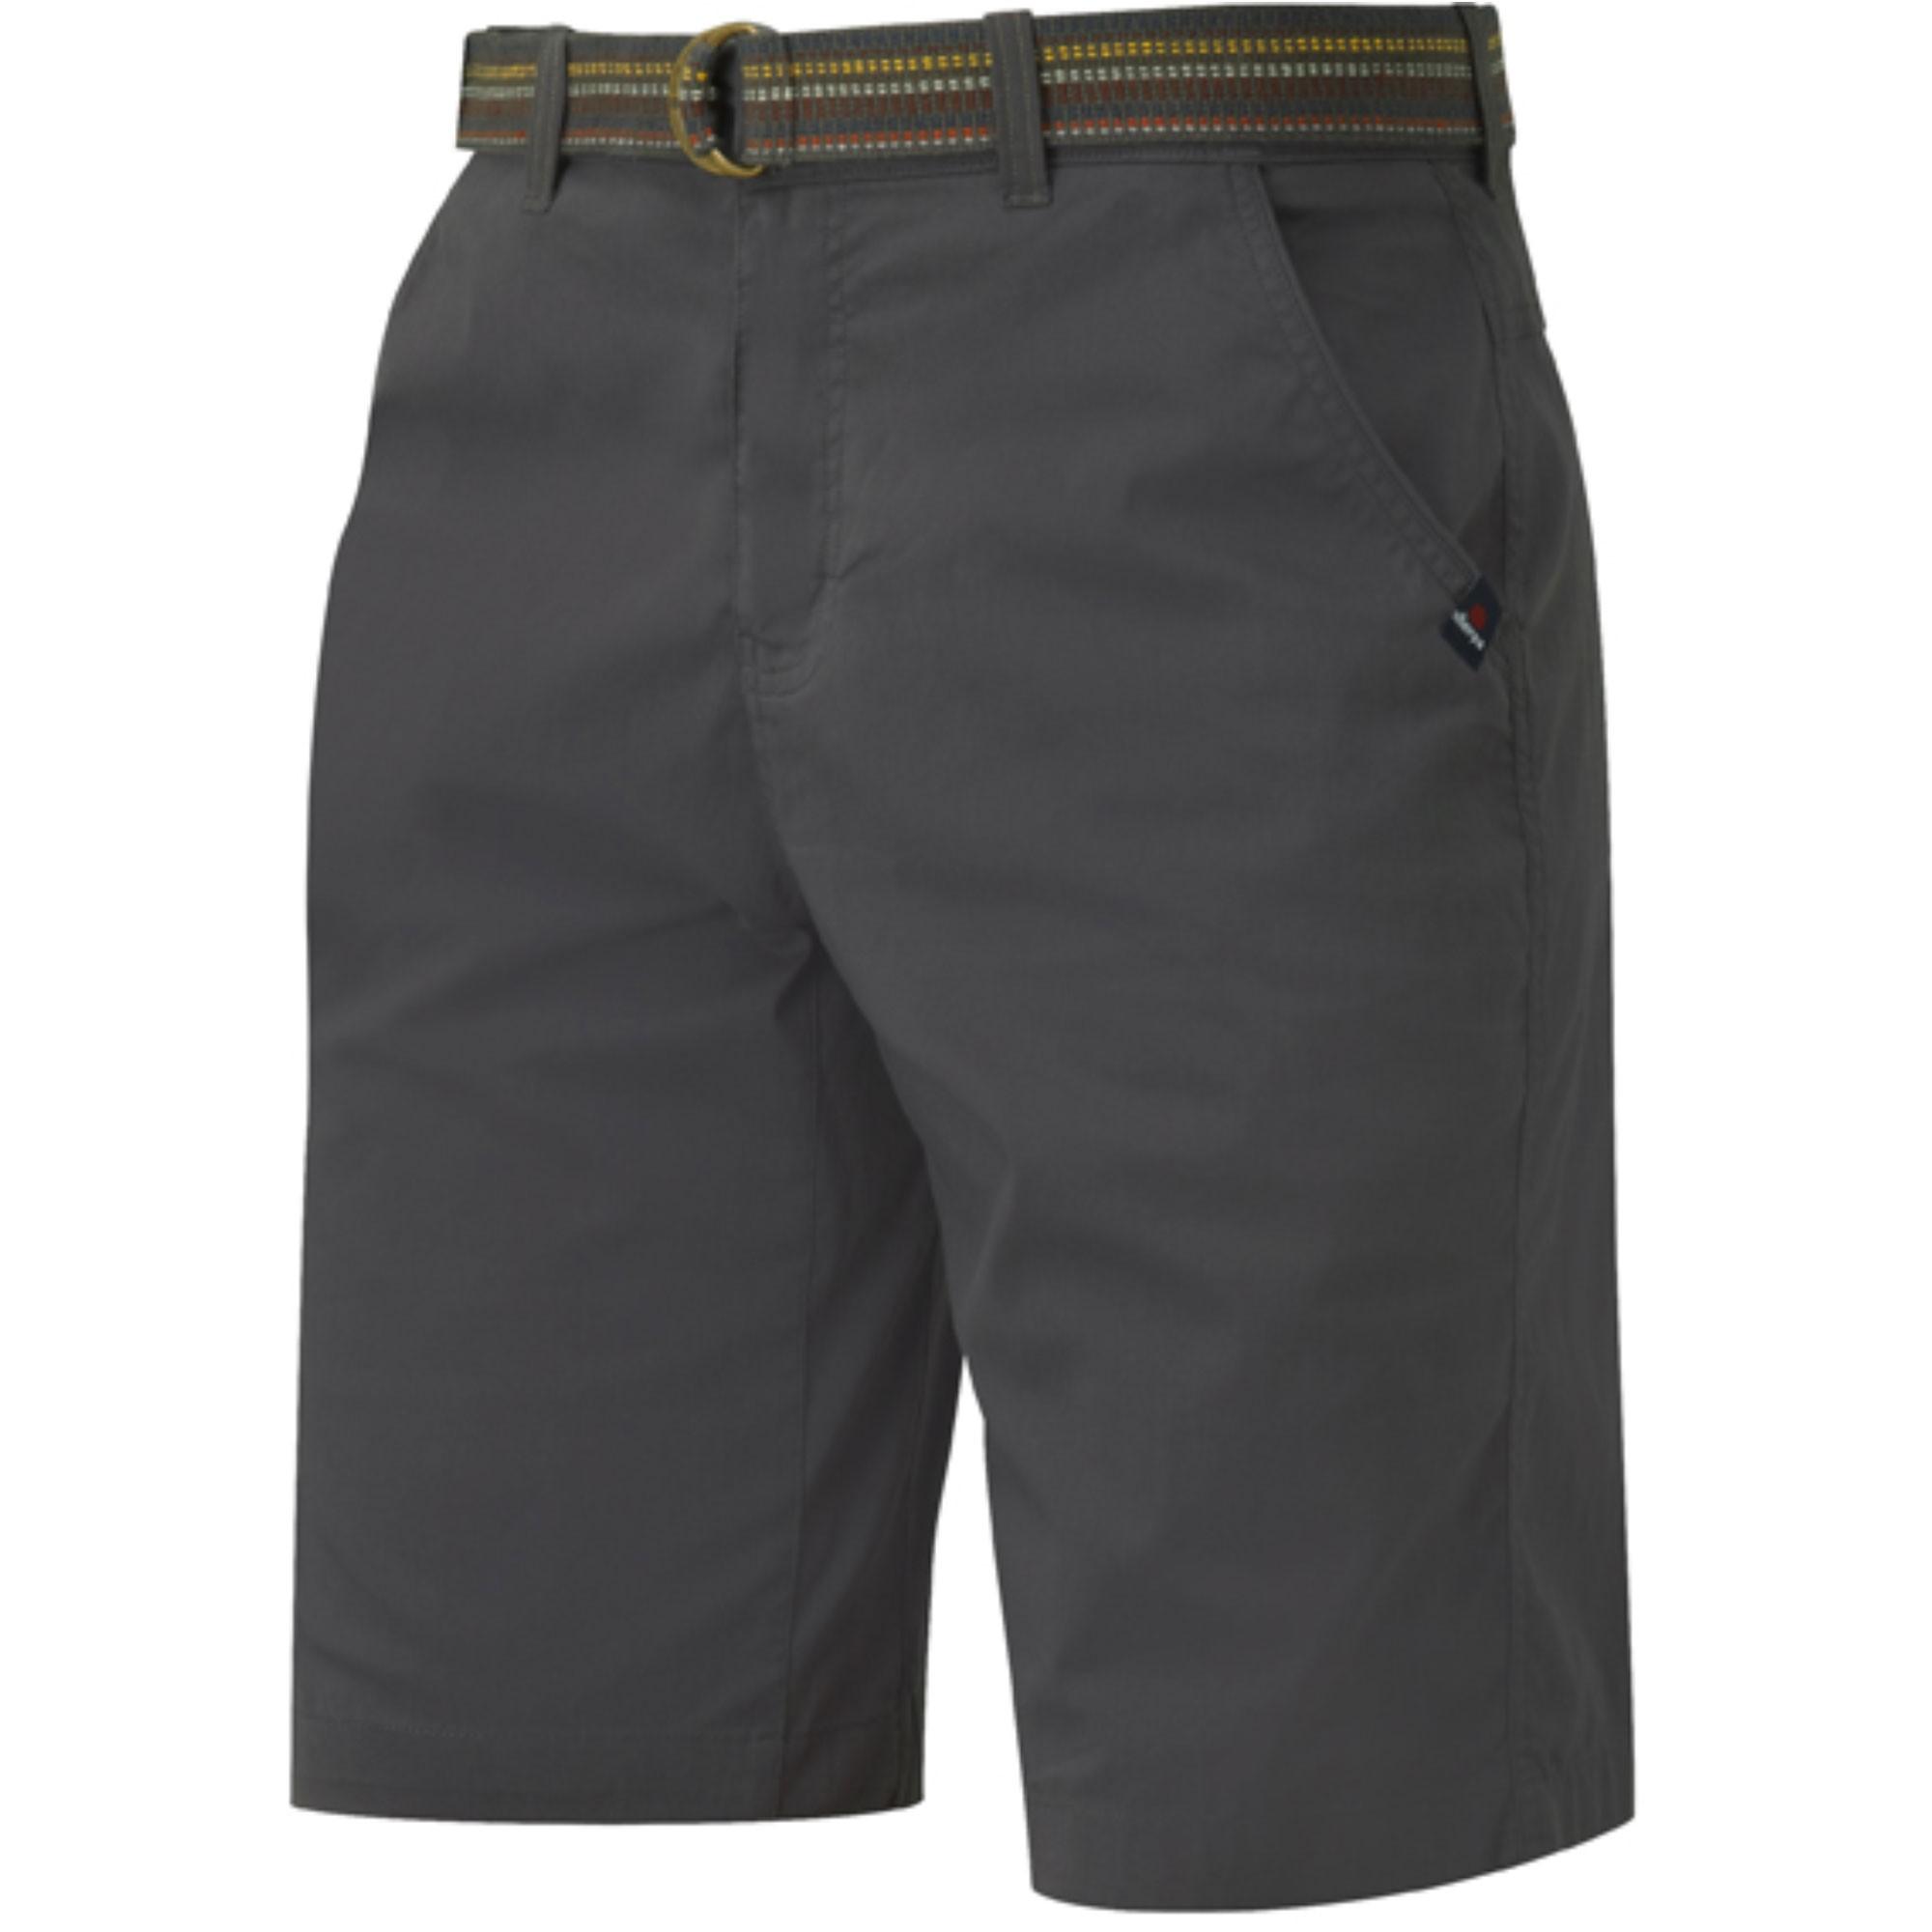 SHERPA - Mirik Shorts